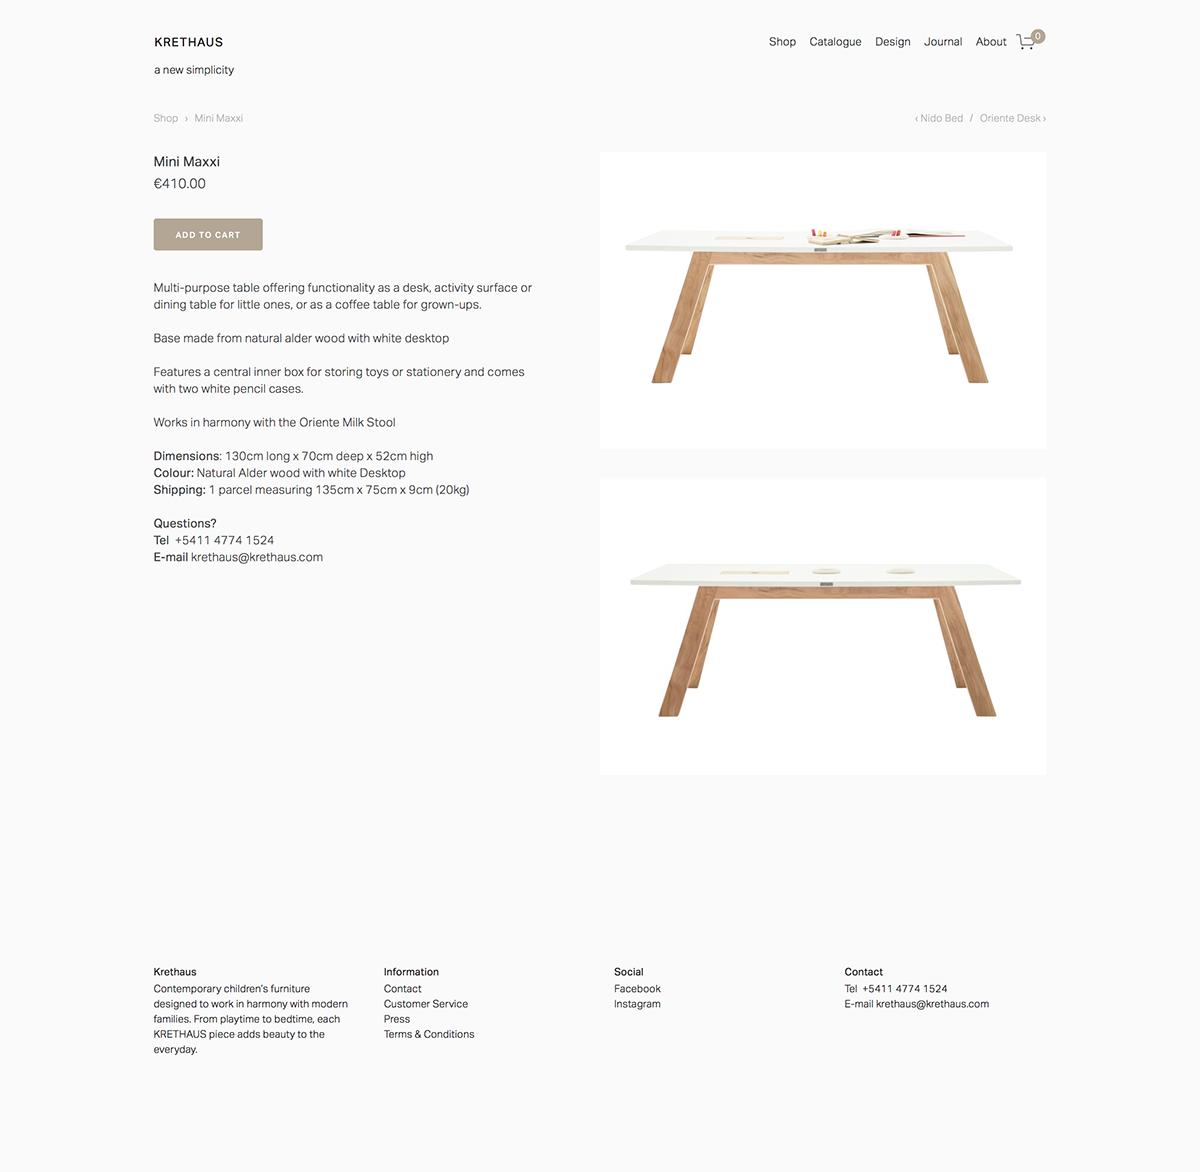 squarespace Krethaus grid Ecommerce childrens furniture argentina The Printer's Son